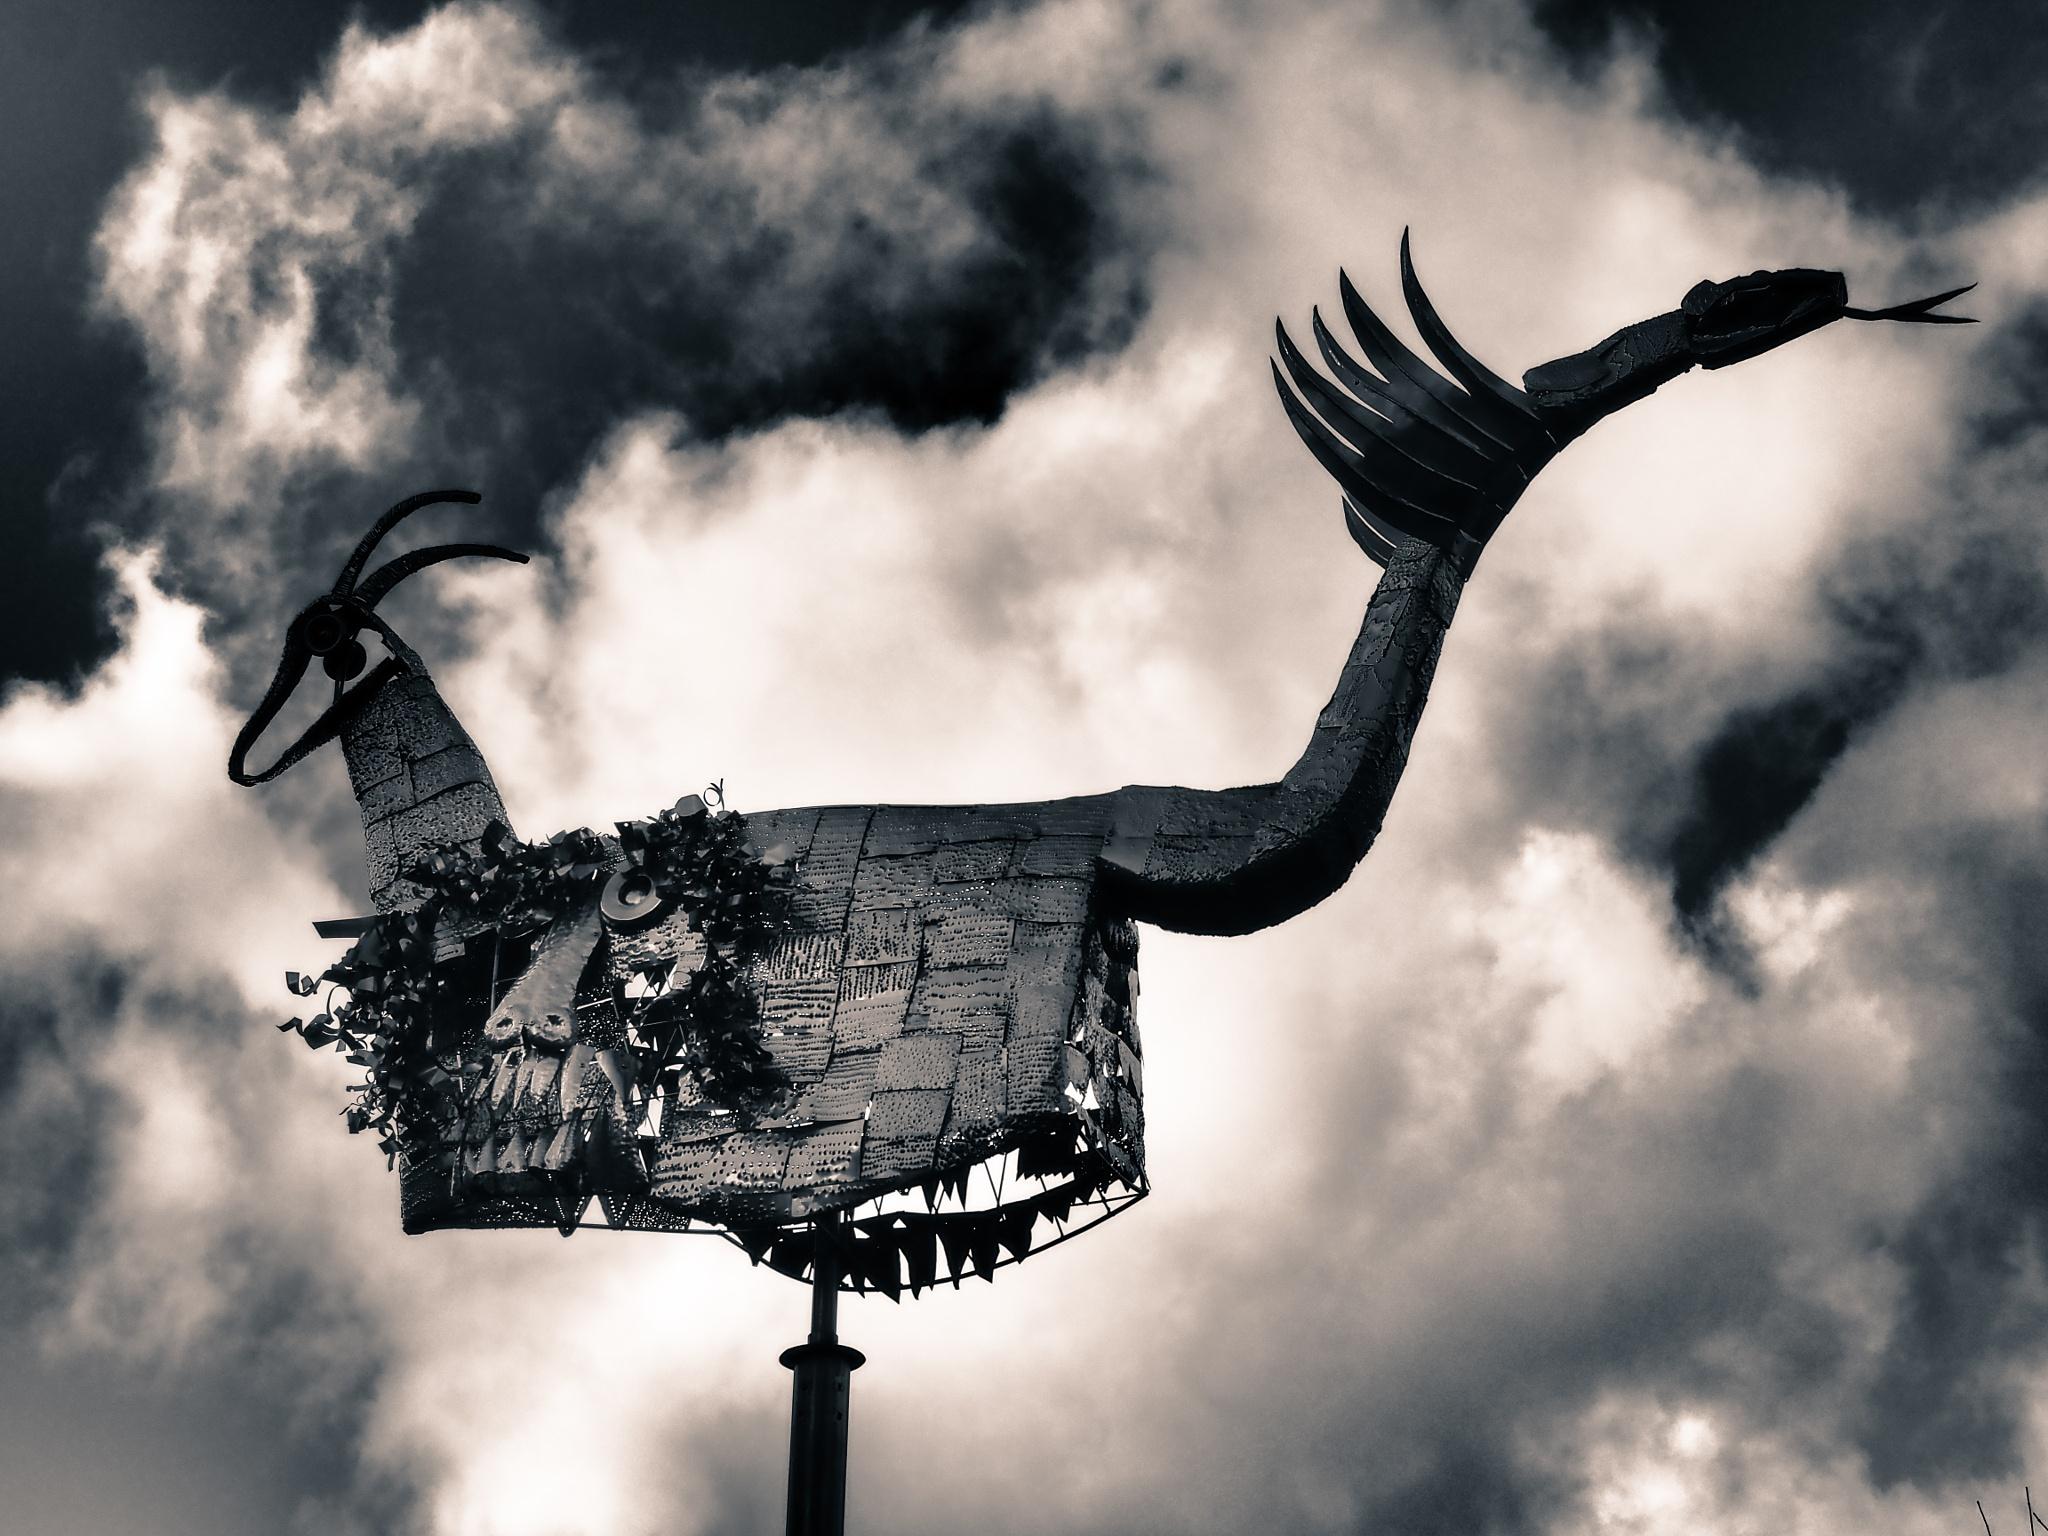 Berlin Flying Steel Horse Black & White by Jeans Brown Photography / Jens Schwarz